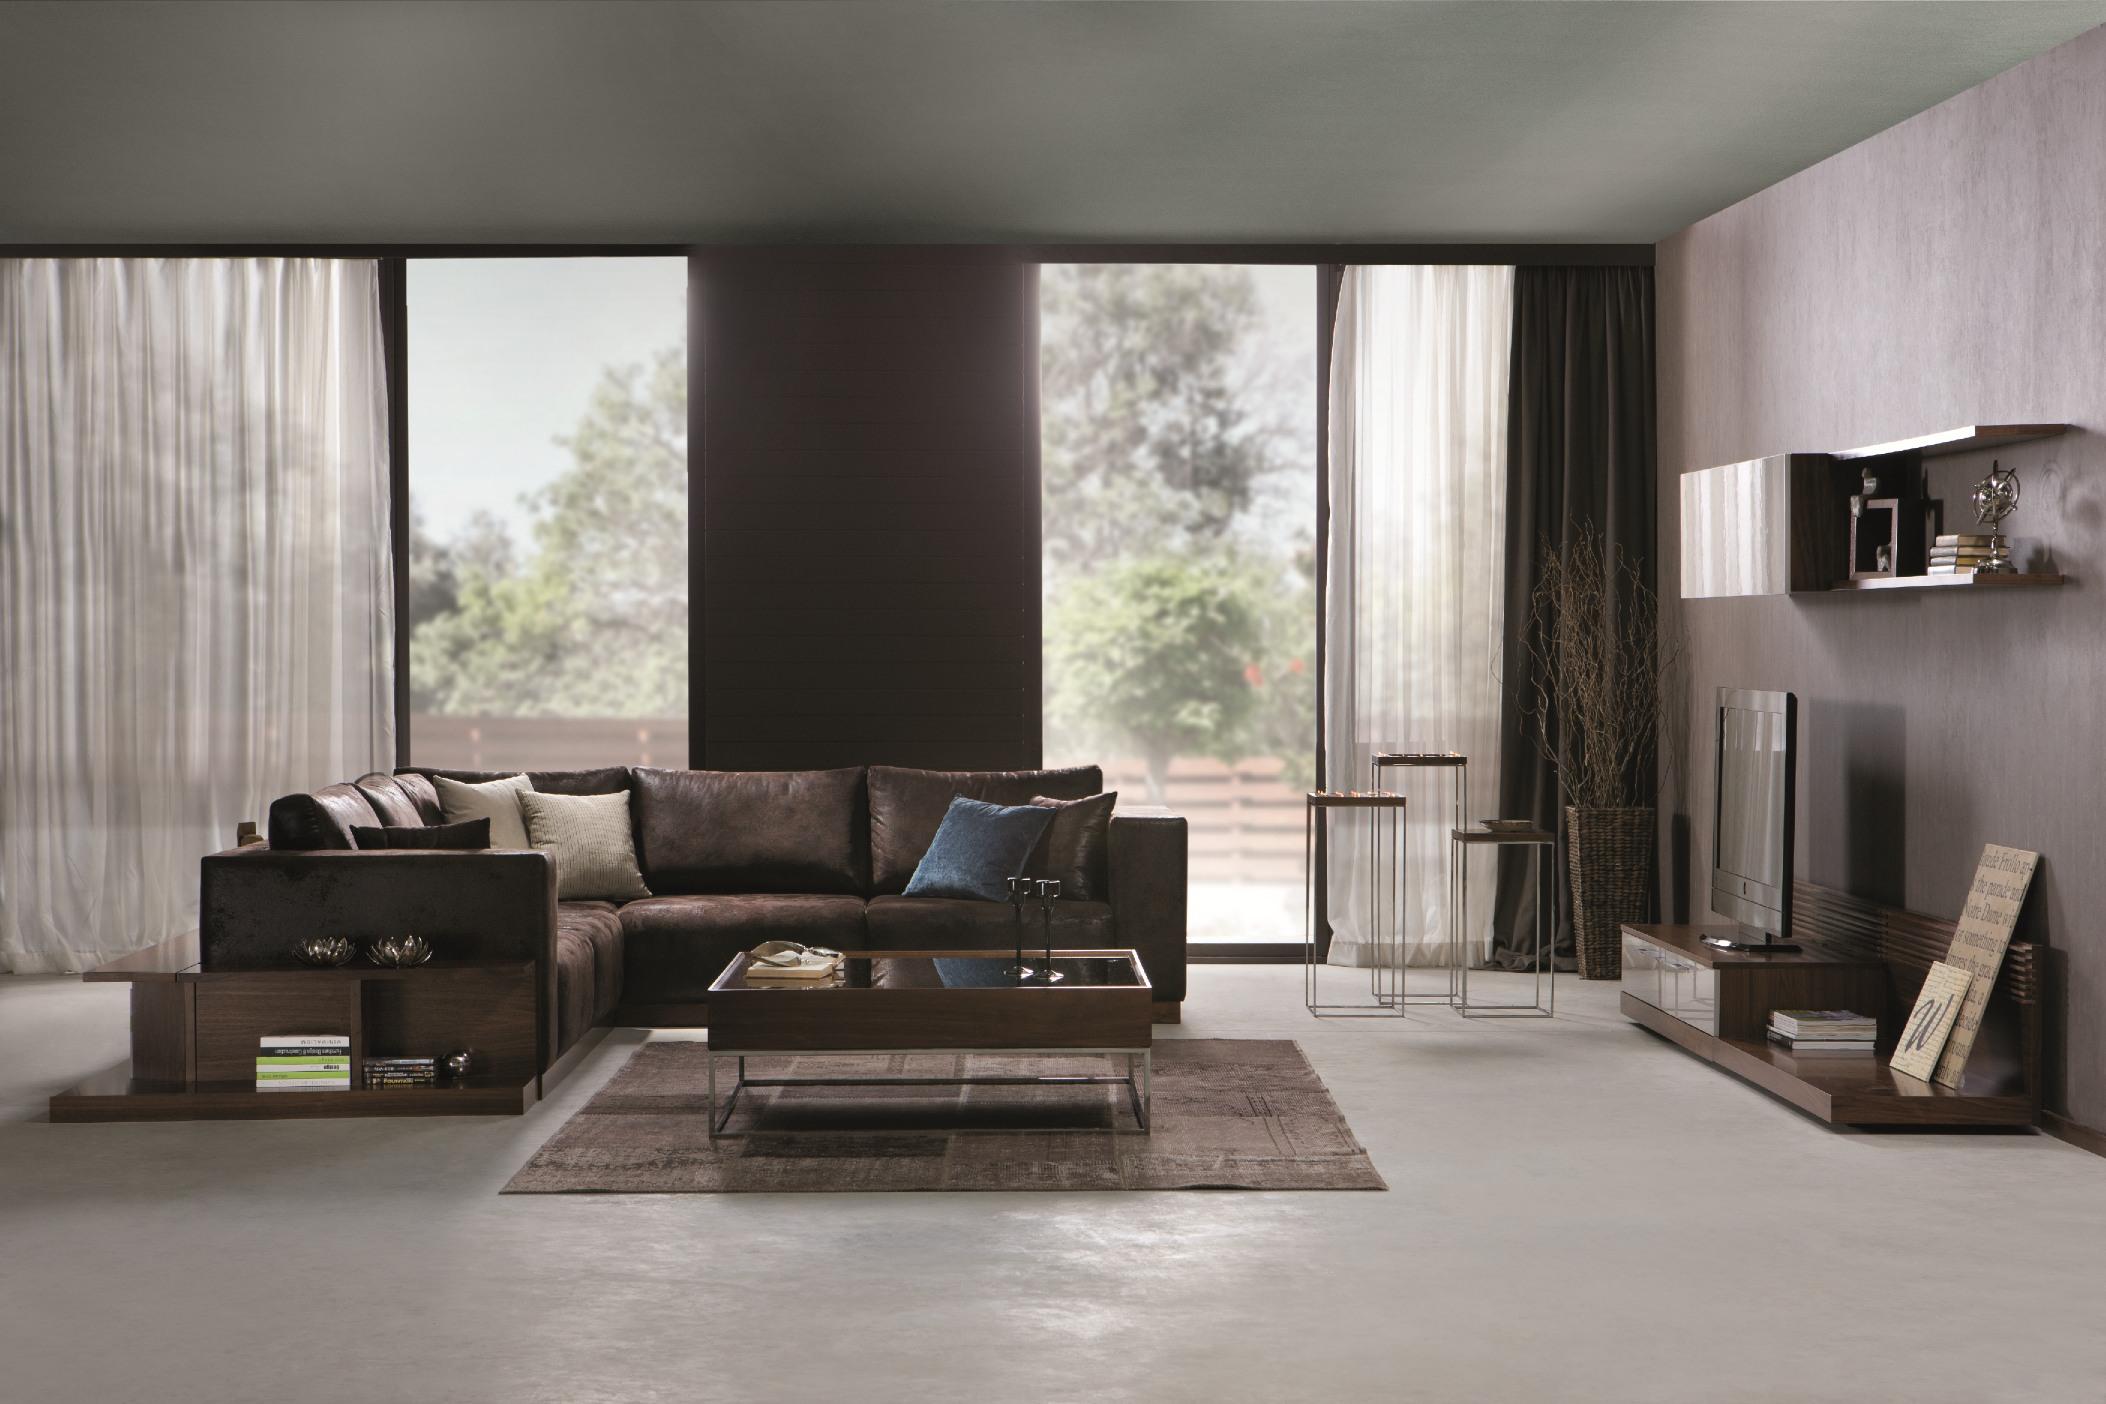 fuga mobilya brio tv ünitesi tera koltuk